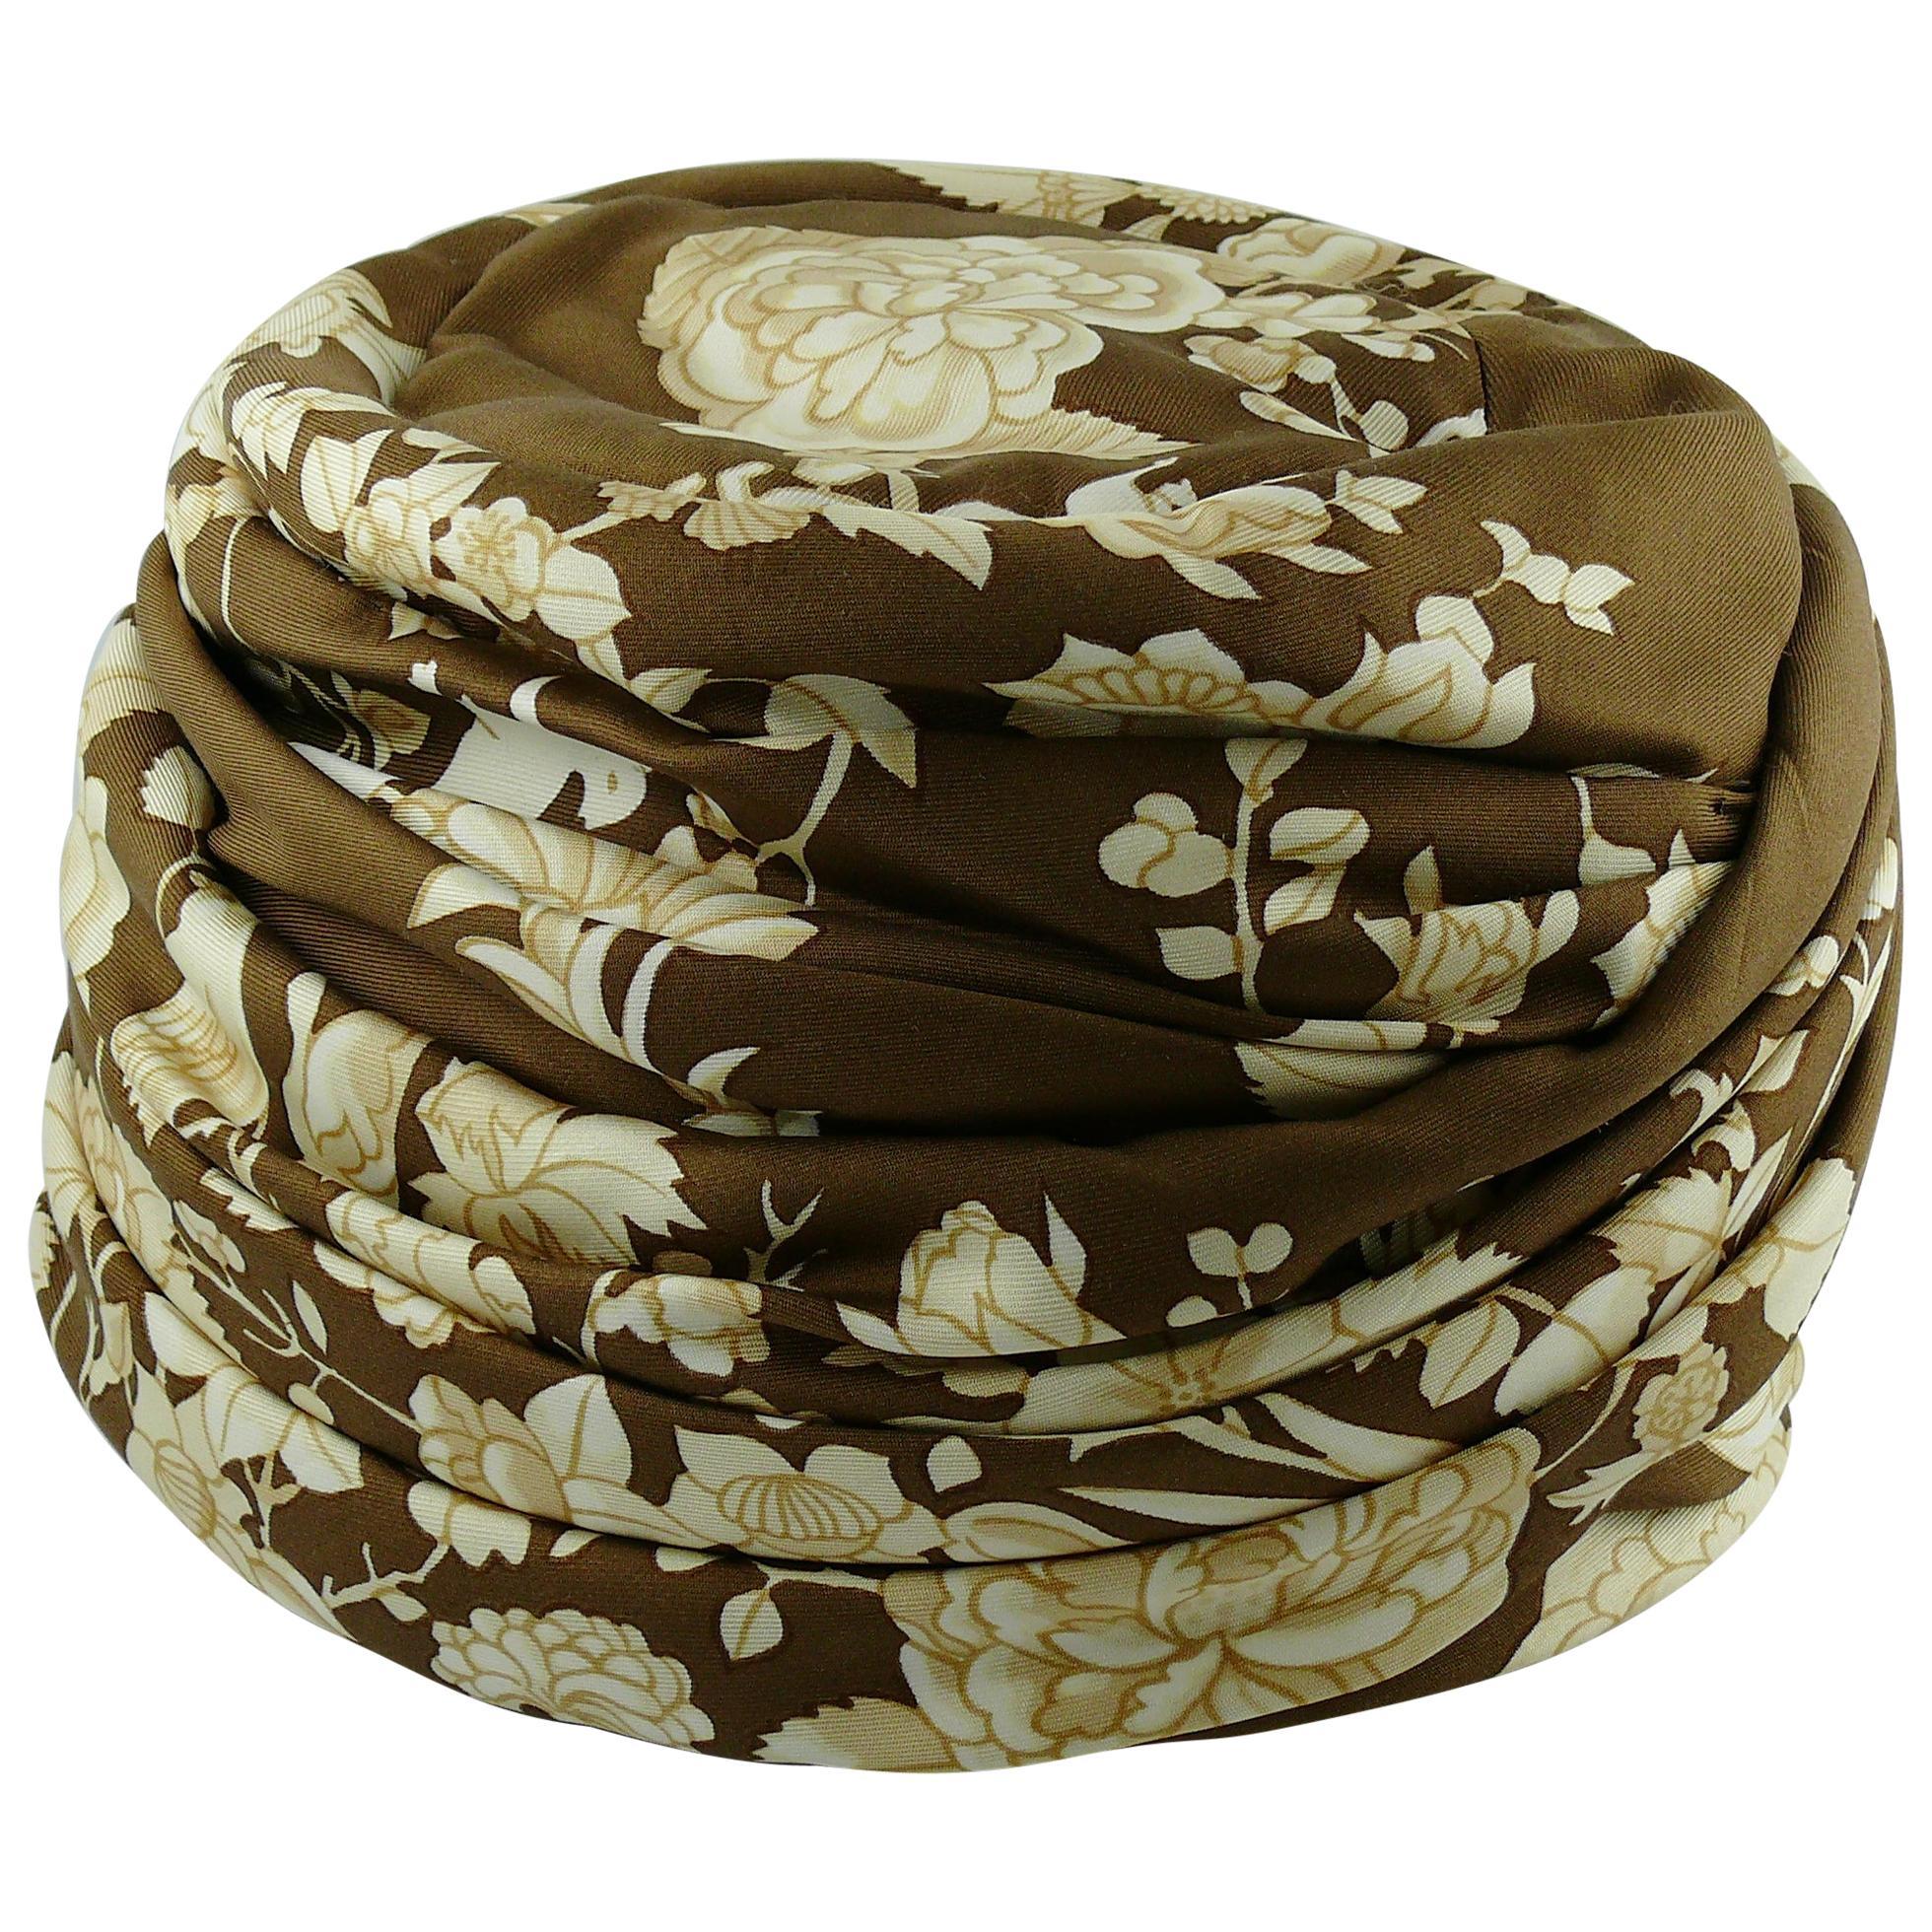 Hermes Vintage Flowers and Birds Silk Turban Hat